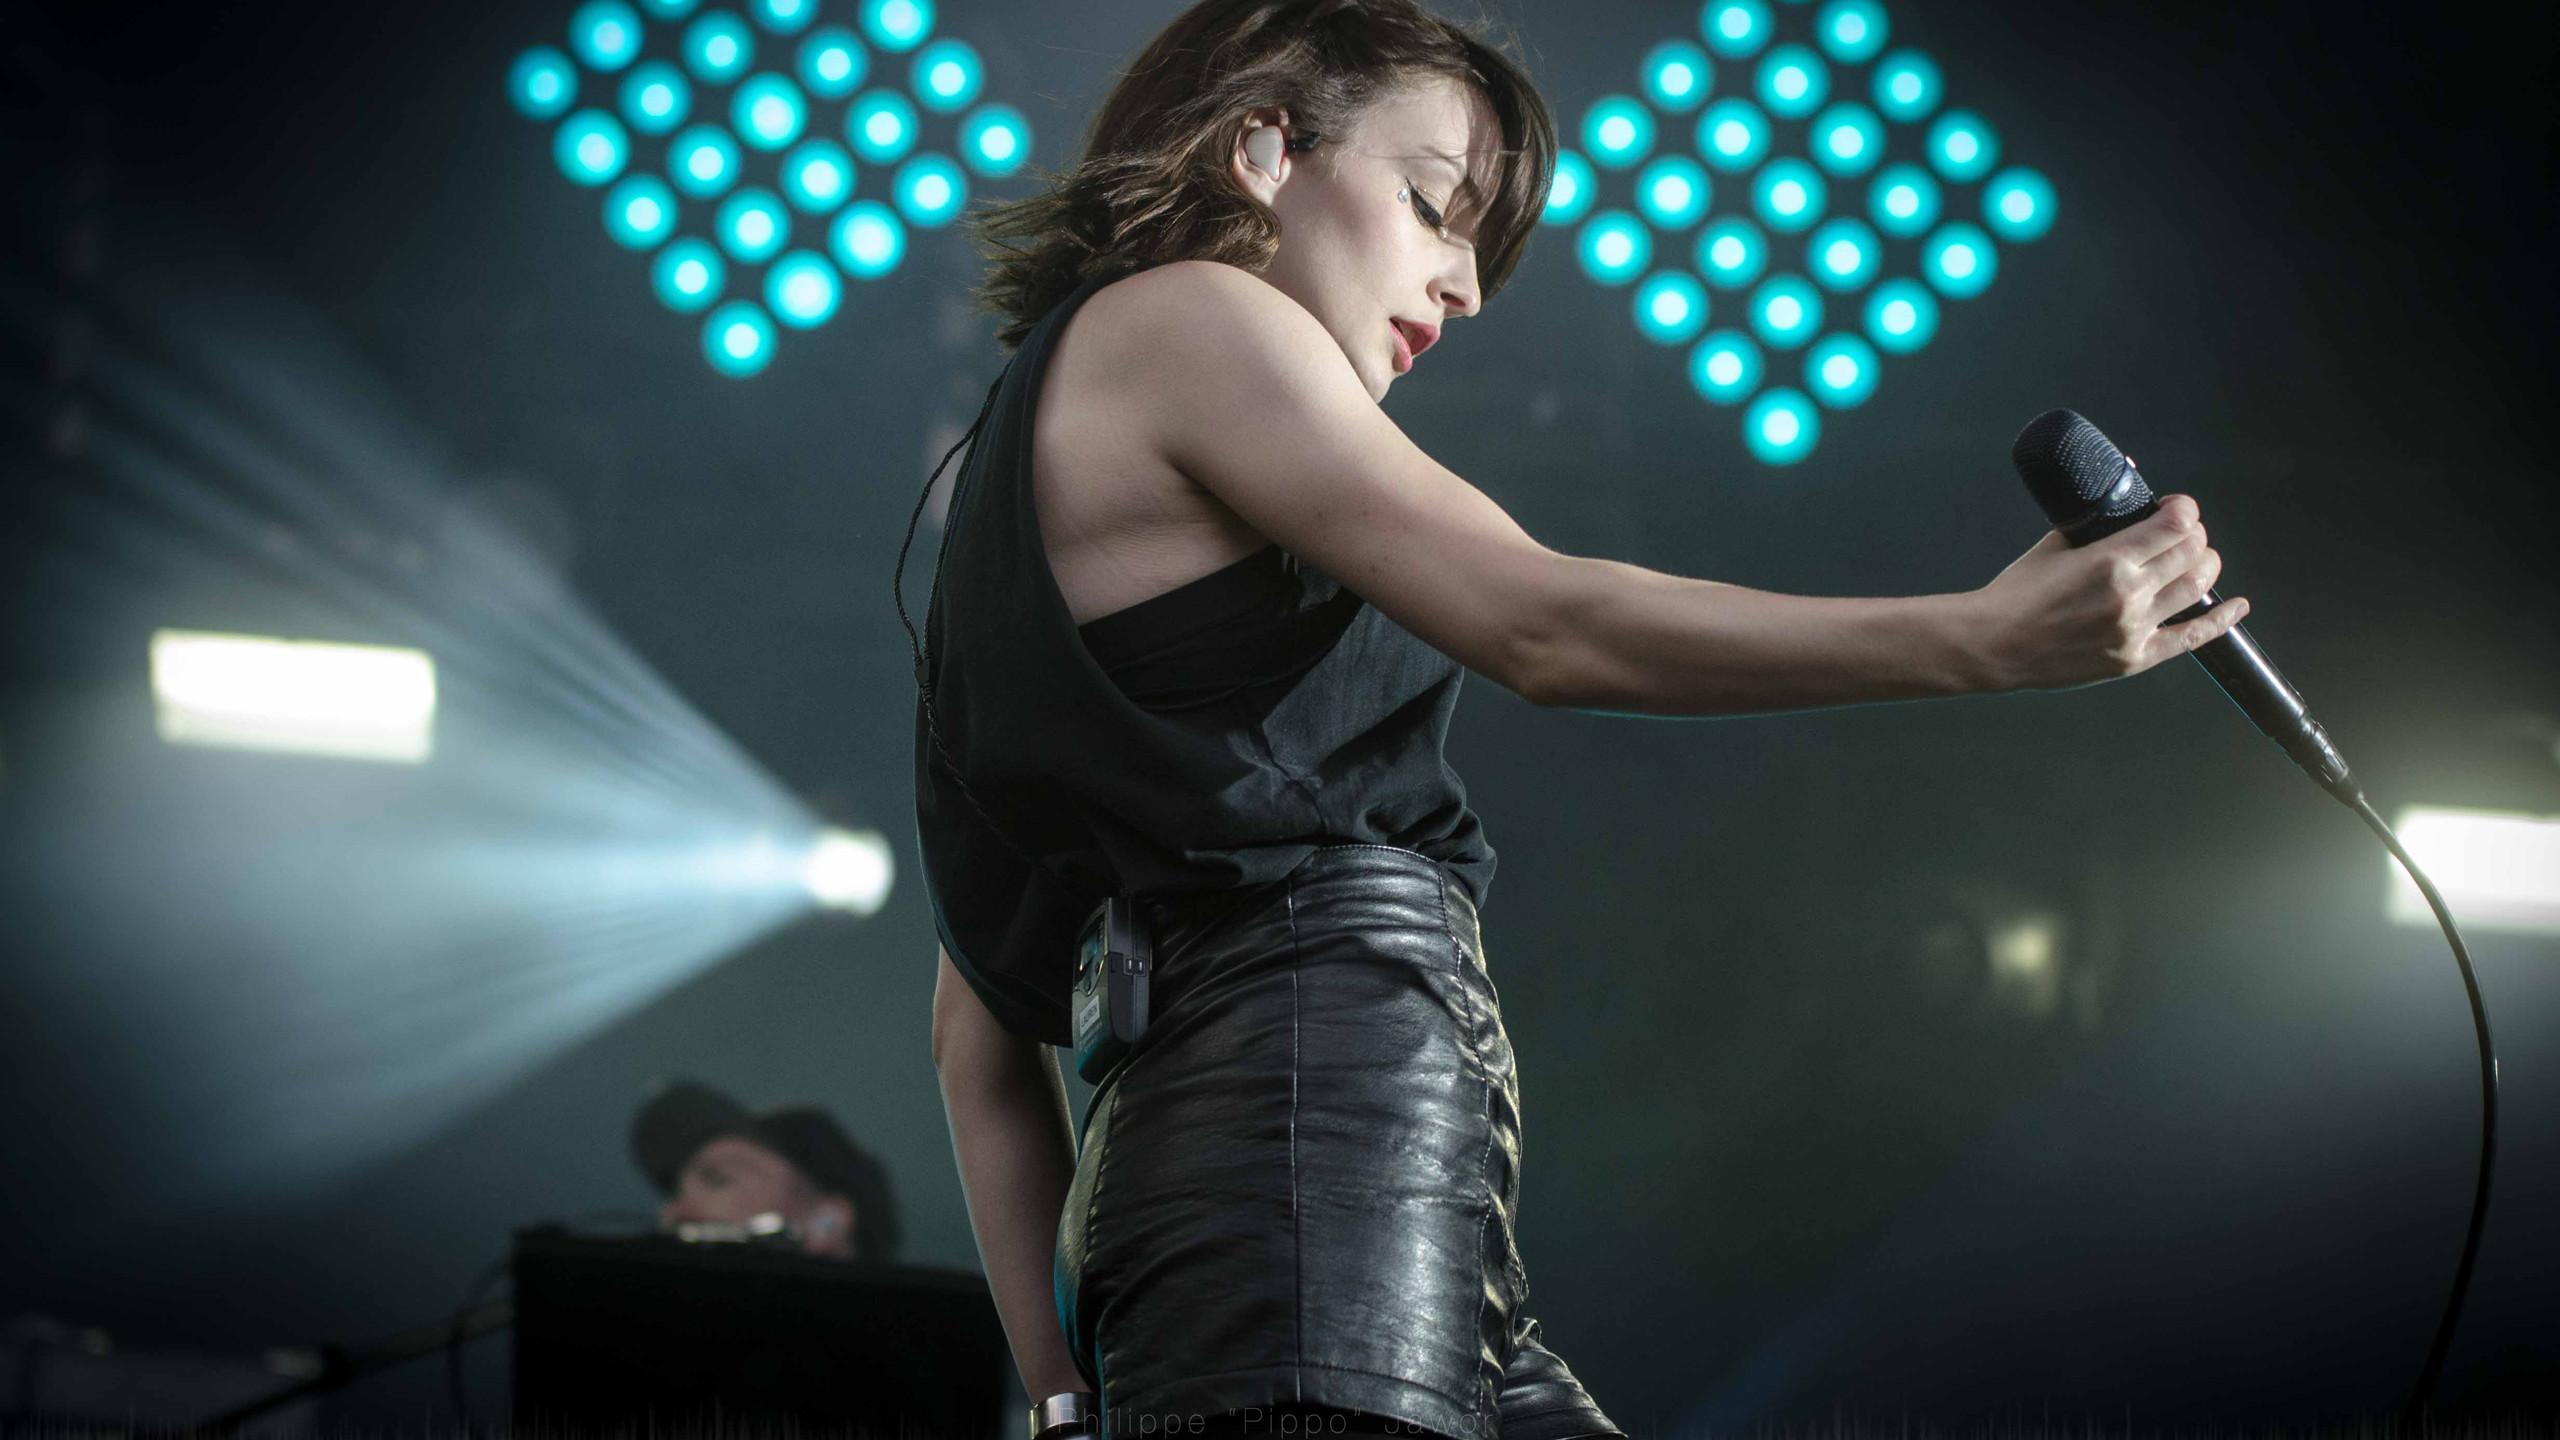 Lauren Mayberry, lead singer of the Scottish pop band Chvrches, at Rock en Seine festival, August 2016.